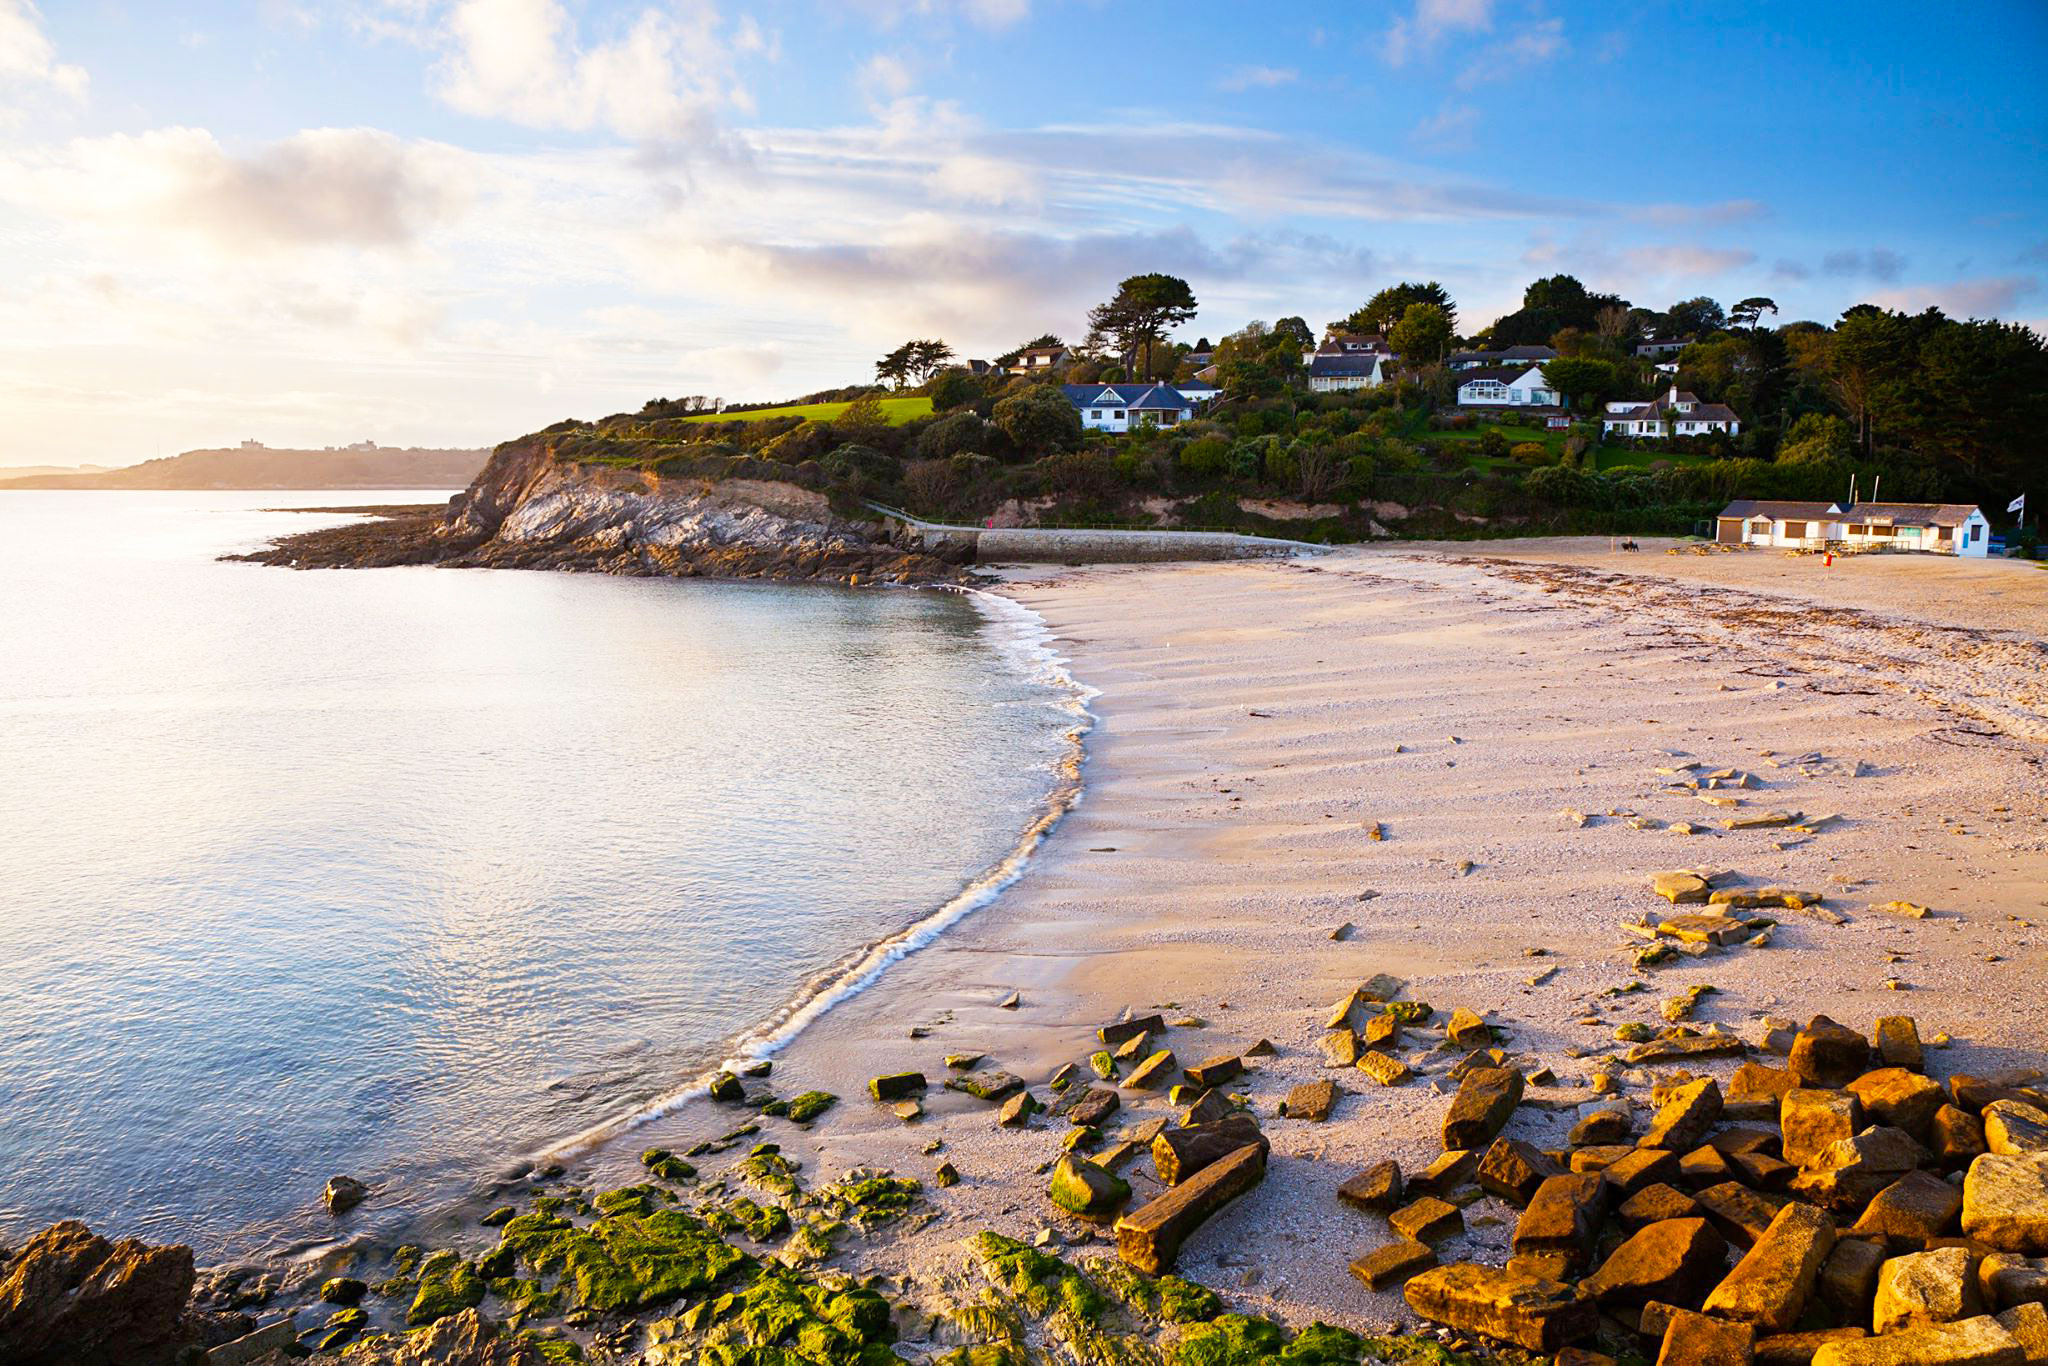 Gylly Beach